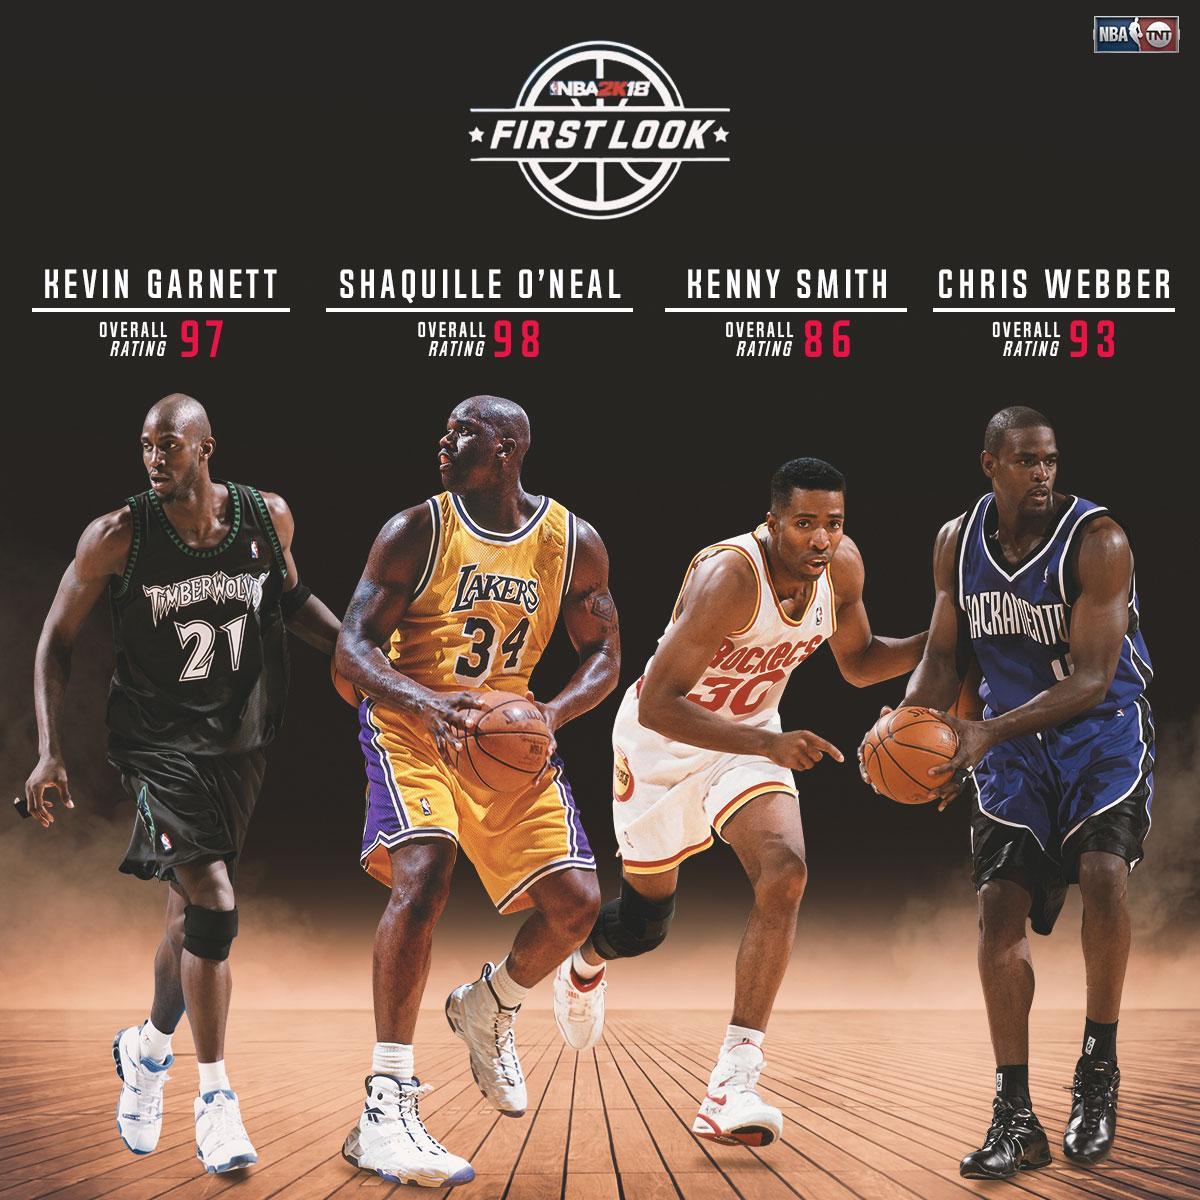 #NBA2K18 player ratings for some TNT ballers... ���� https://t.co/BVvYstJxRD